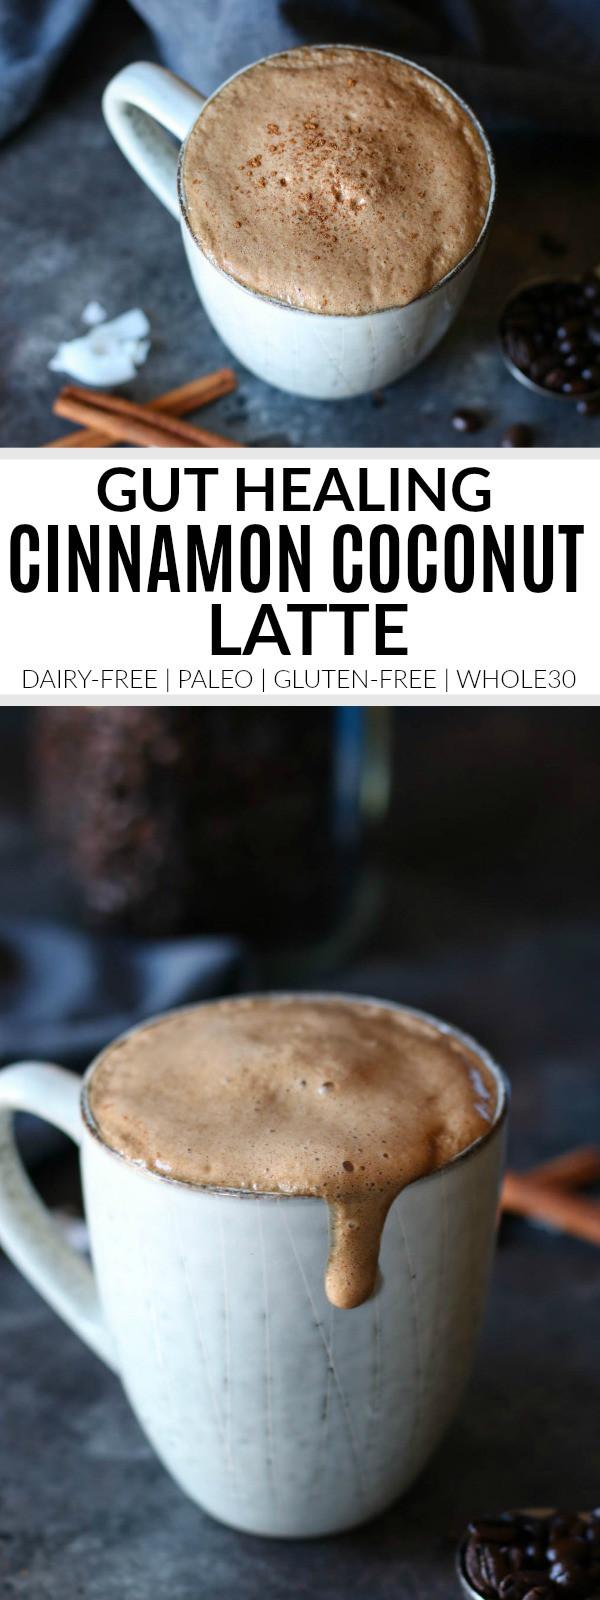 coconut lattecinnamon coconut latte